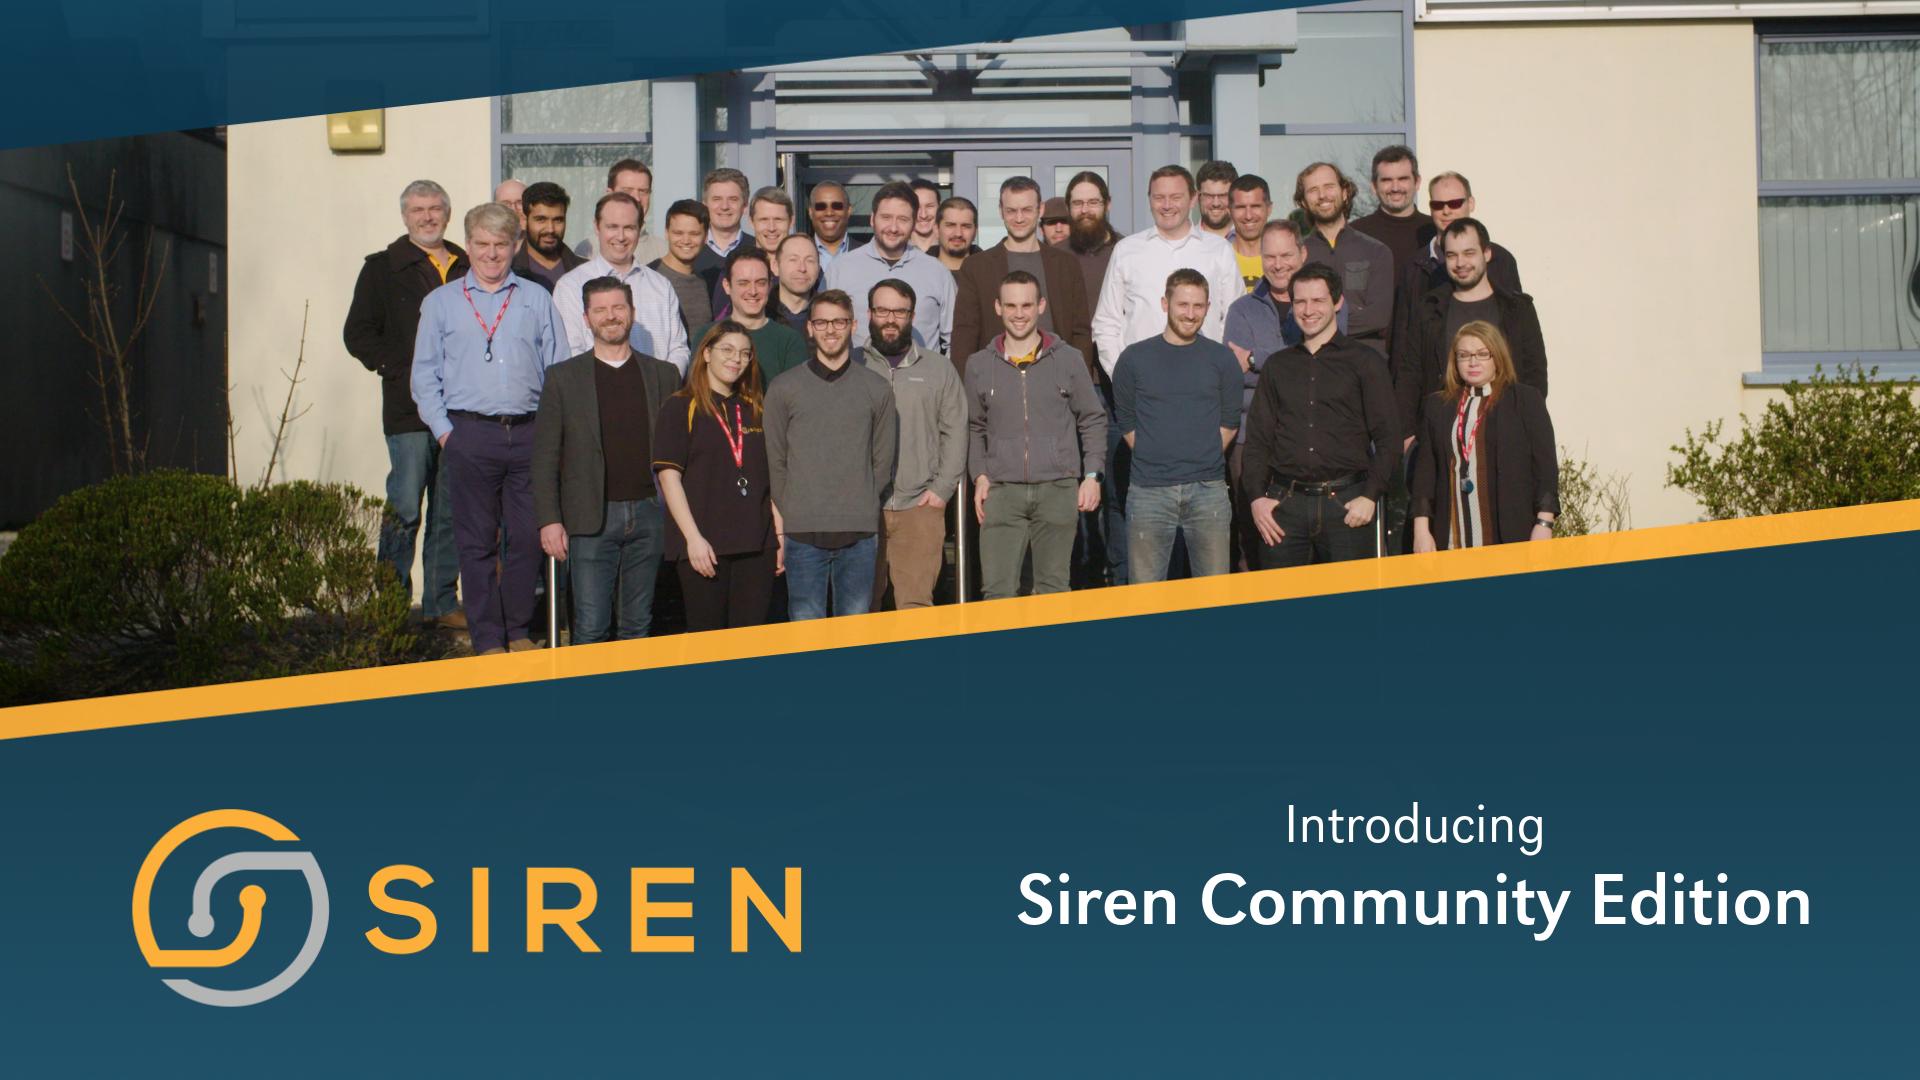 siren full movie download free